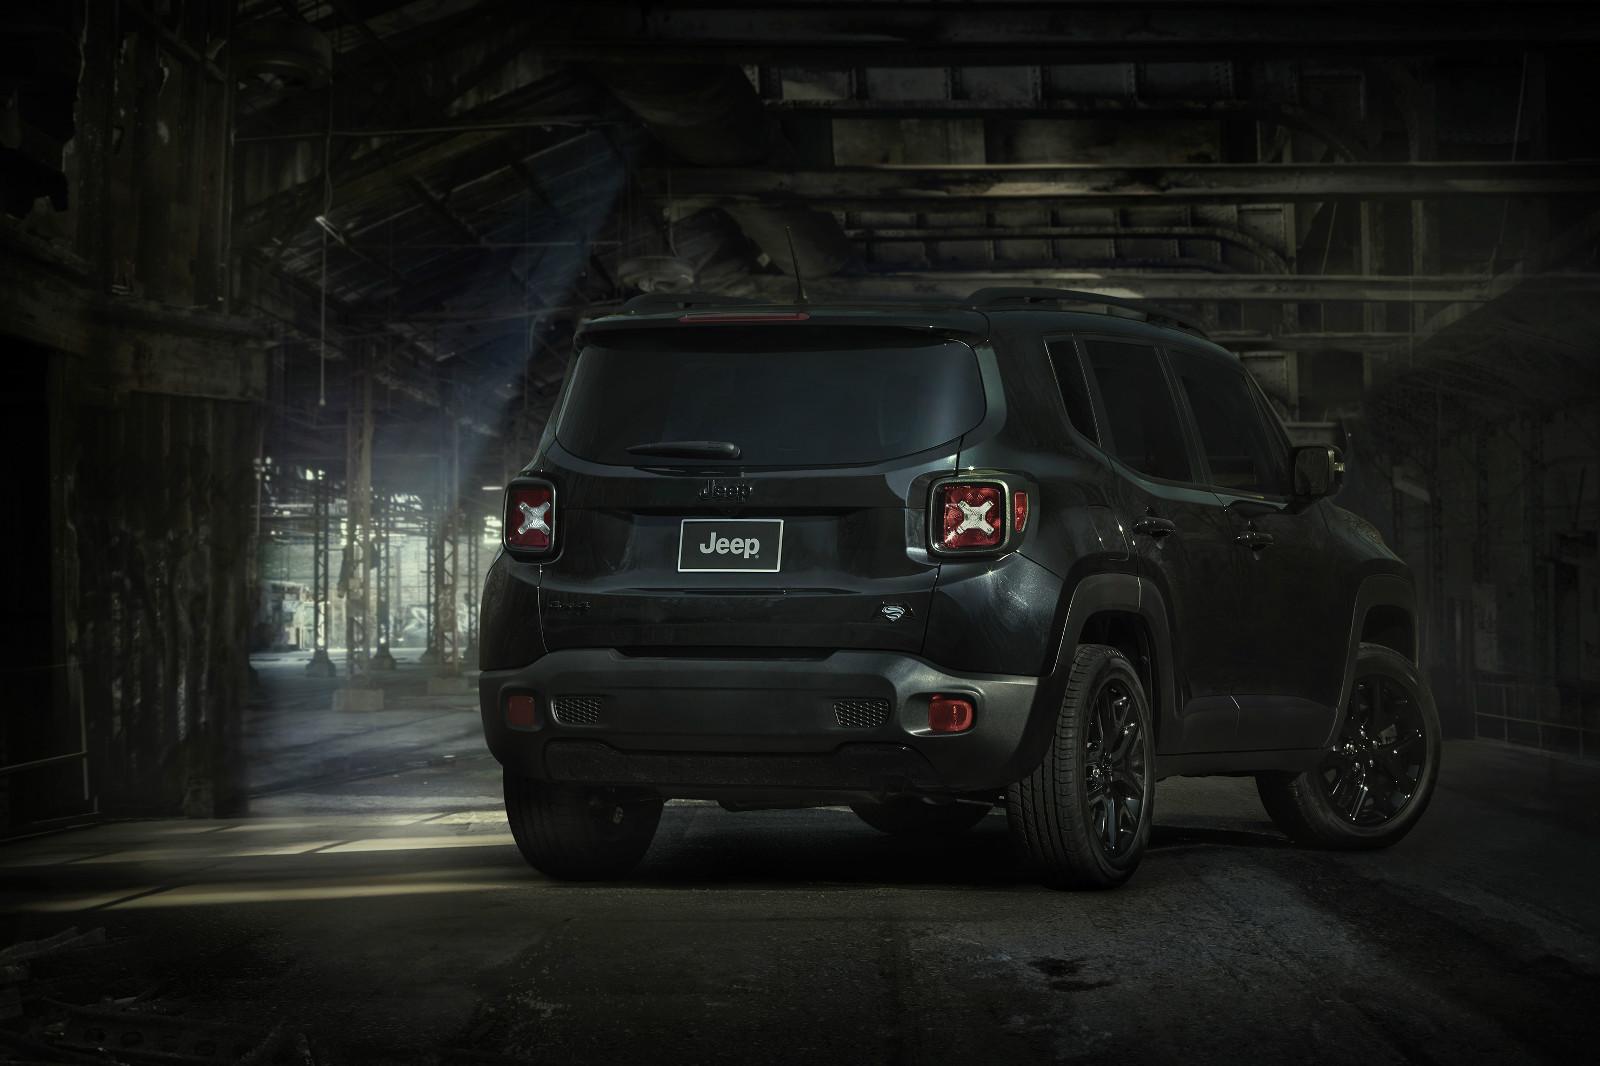 renegade Jeep Renegade Justice! Ένα Jeep για ήρωες! Batman vs Superman, compact SUV, Jeep, Jeep Renegade, Jeep Renegade Justice